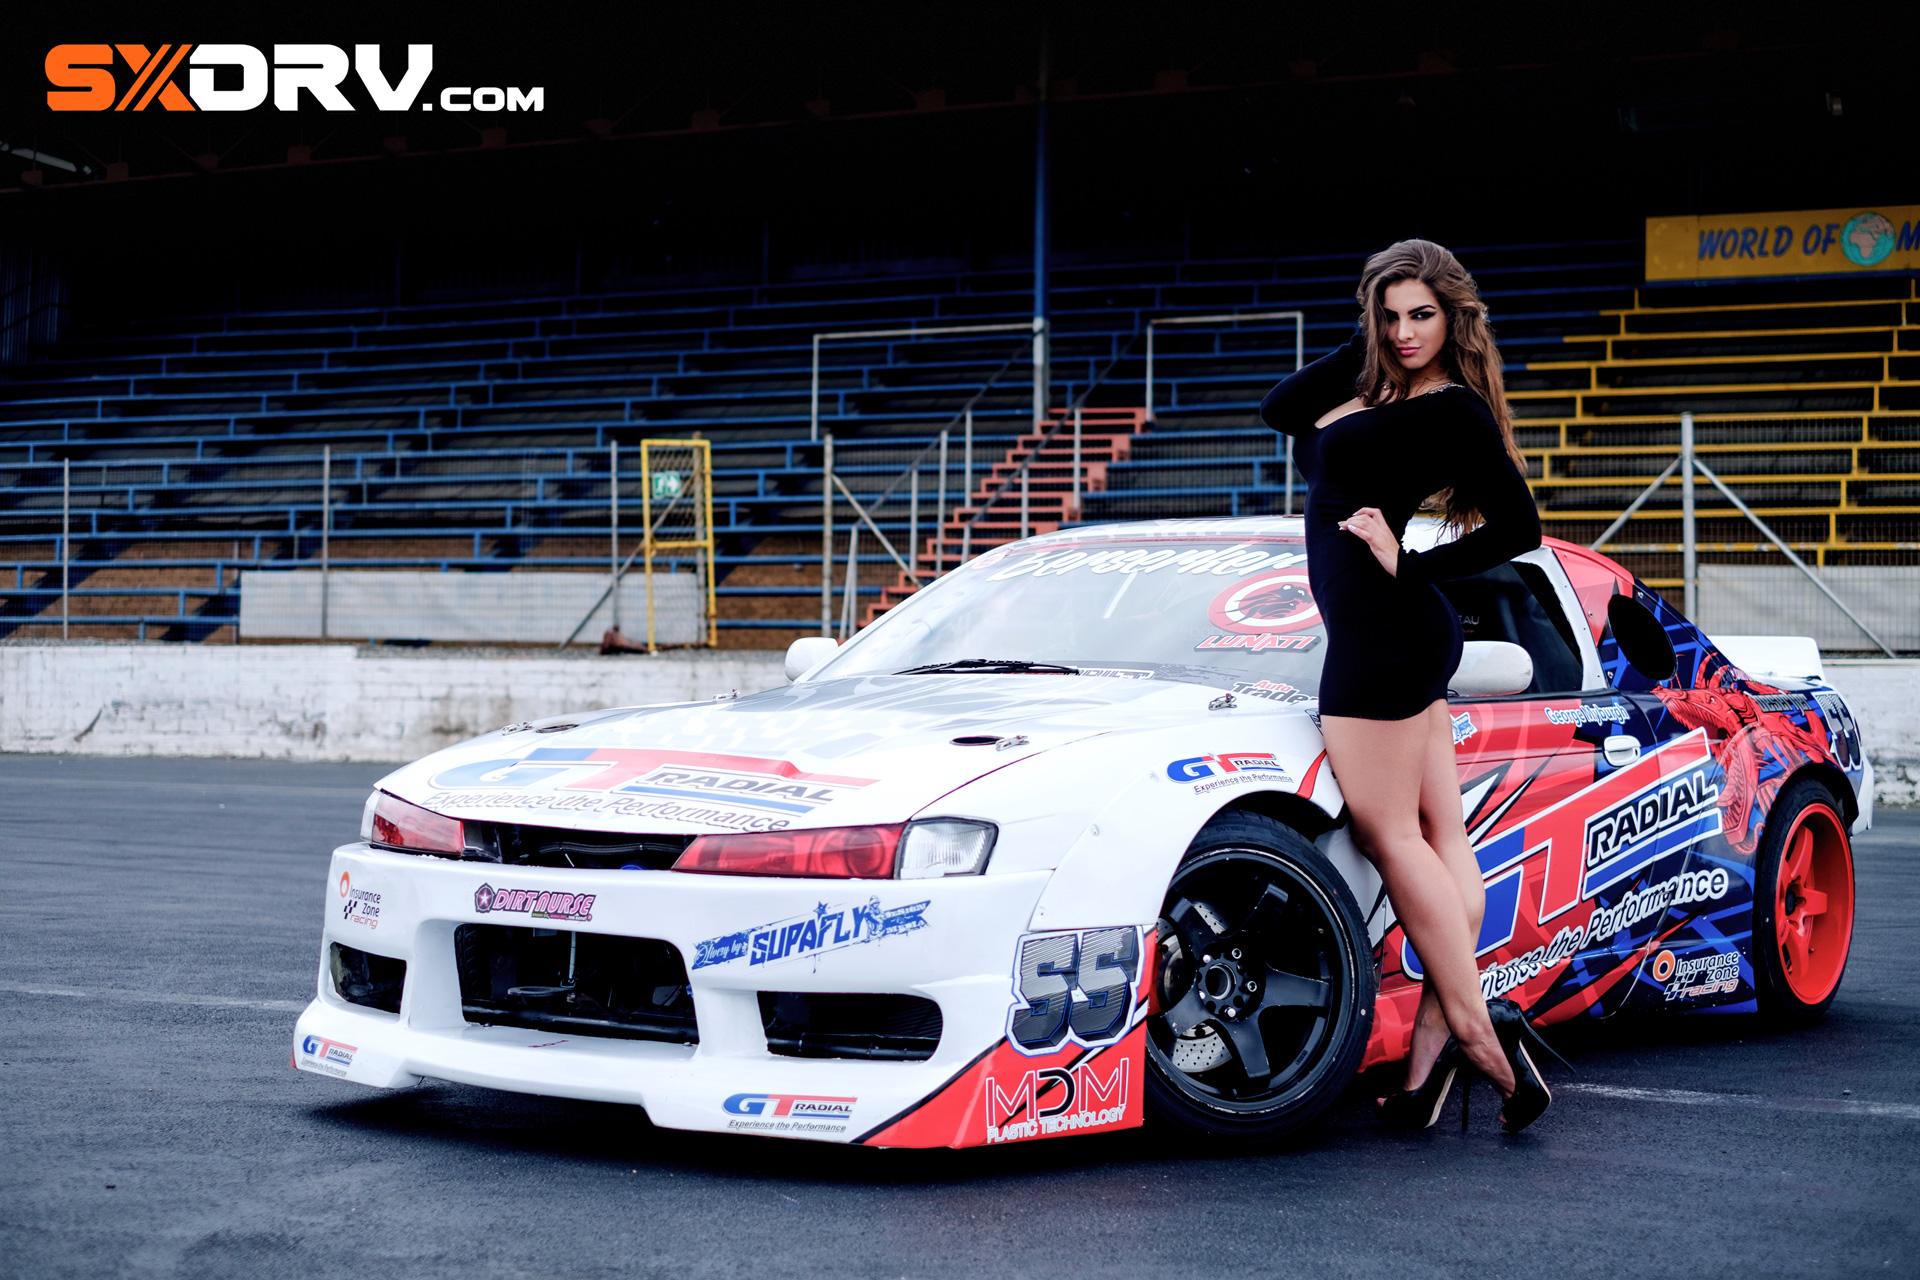 Subaru Diesel Usa >> Natasha Catherine - Nissan Silvia S14 - Exclusive Interview And Pictures